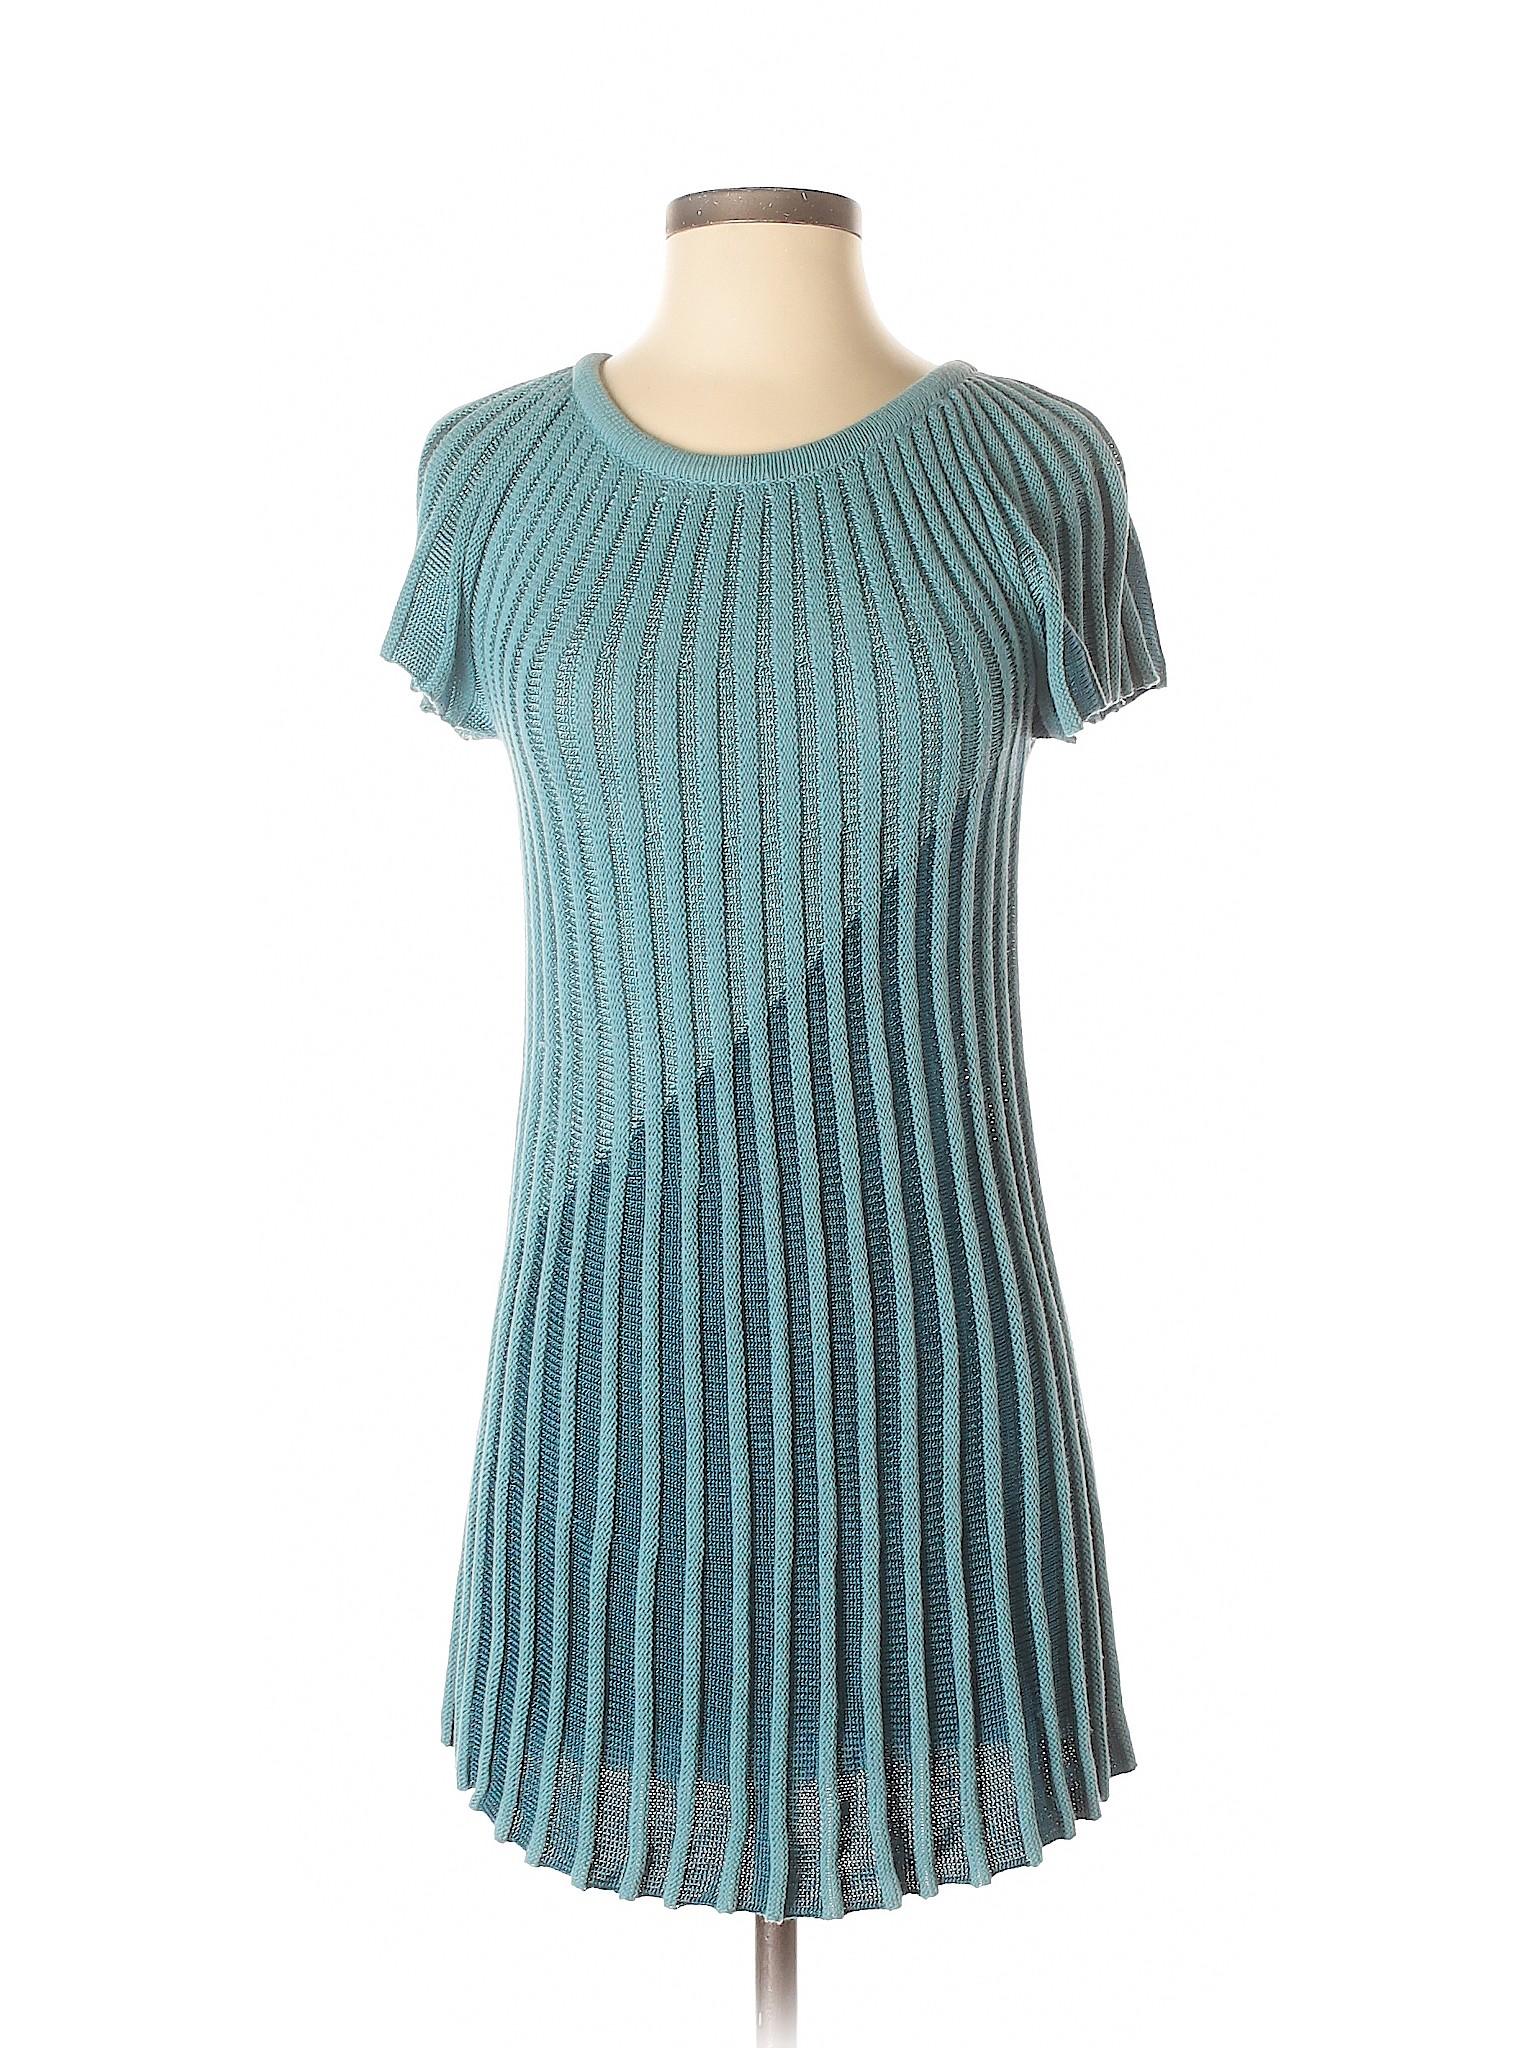 IMAN Dress Selling Selling IMAN Casual nqWEYx6HwE